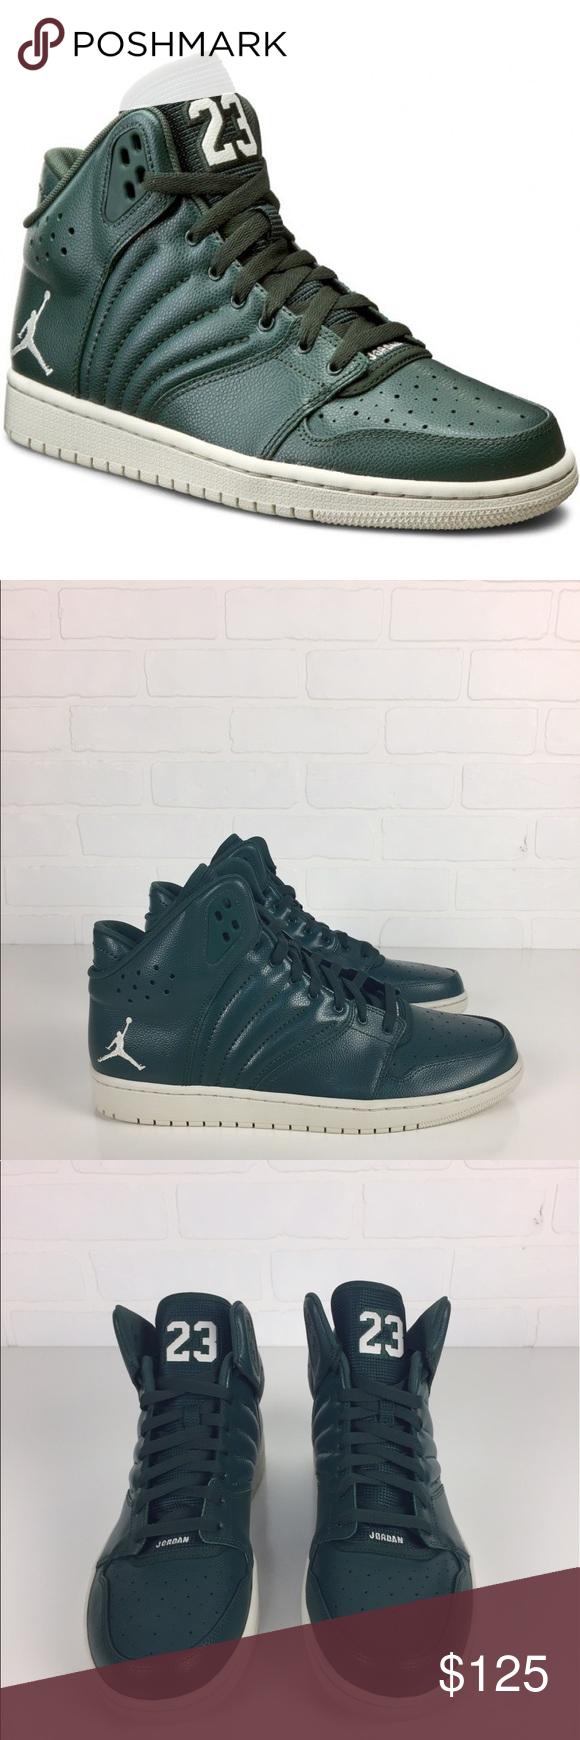 655321db1a4d31 NEW Nike Air Jordan 1 Flight 4 820135-300 Shoes 12 -Details- Retail ...